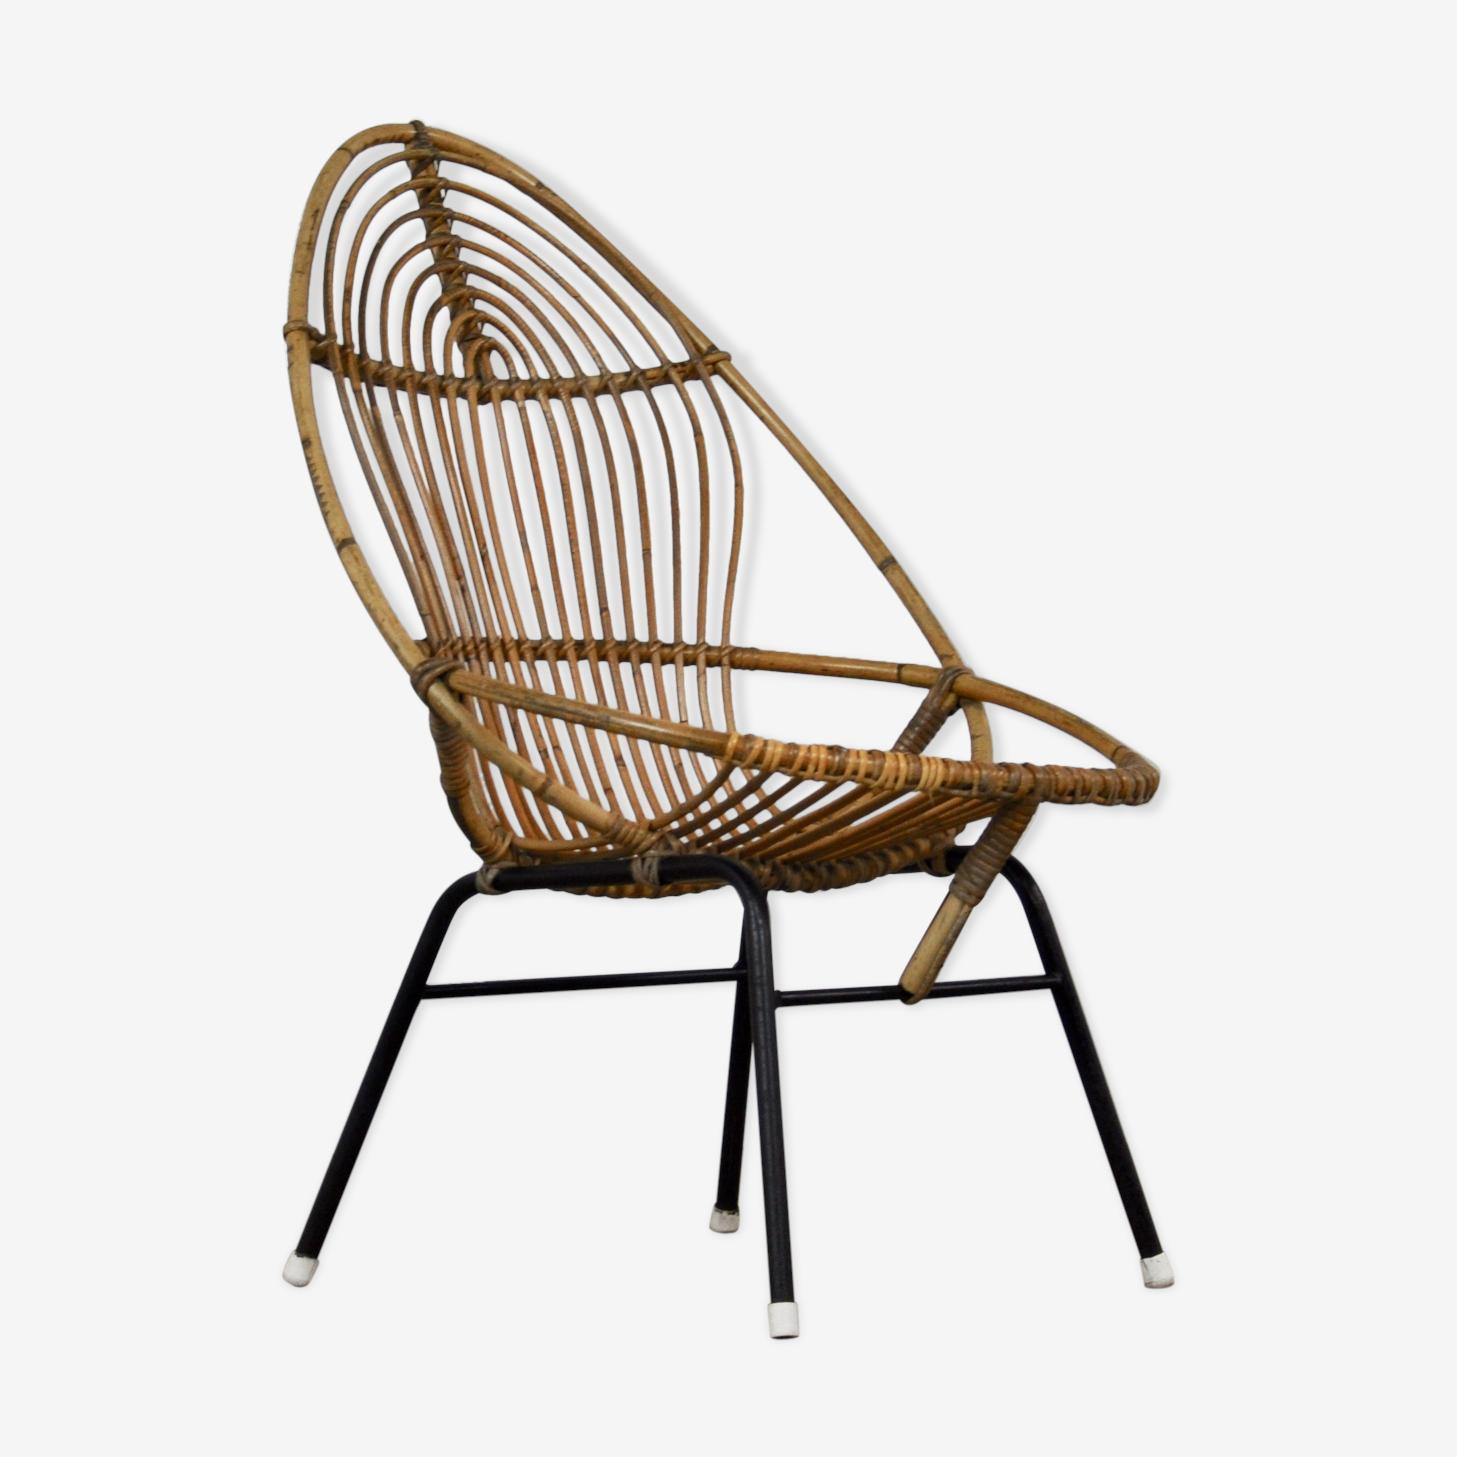 Armchair in rattan by Rohe Noordwolde, 1960 s